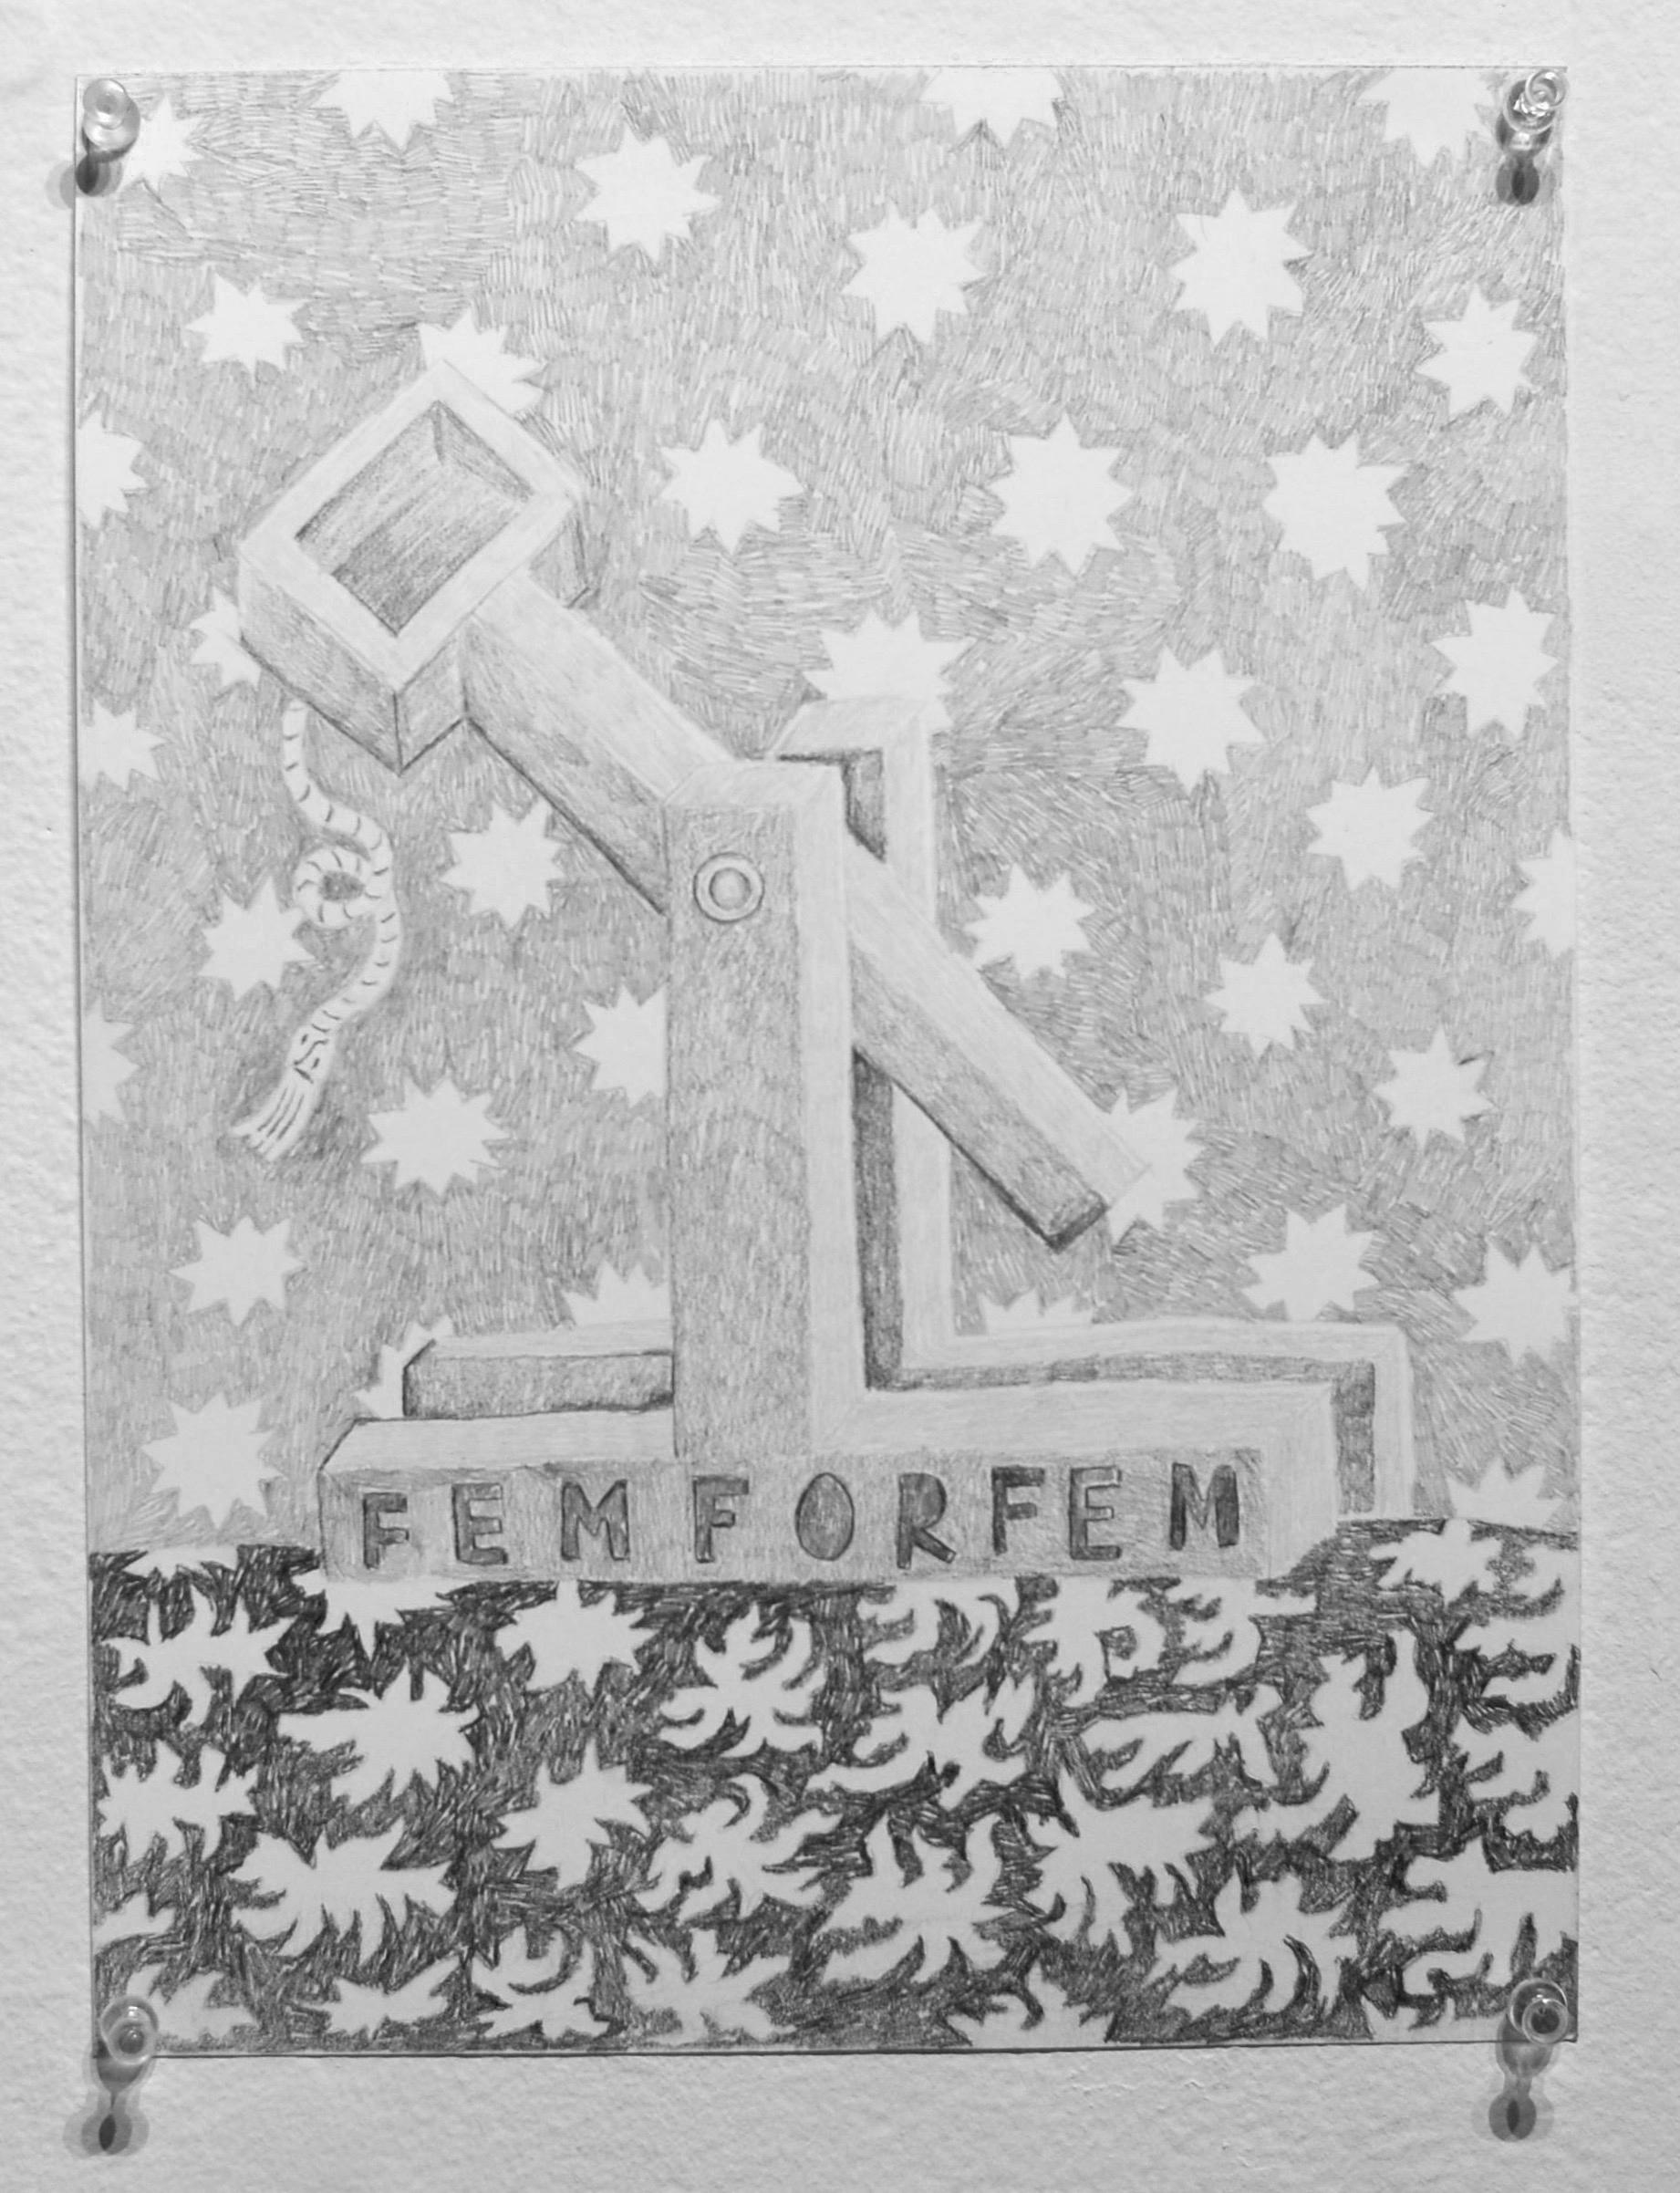 "femforfem, 9x12"", graphite on paper, 2018"